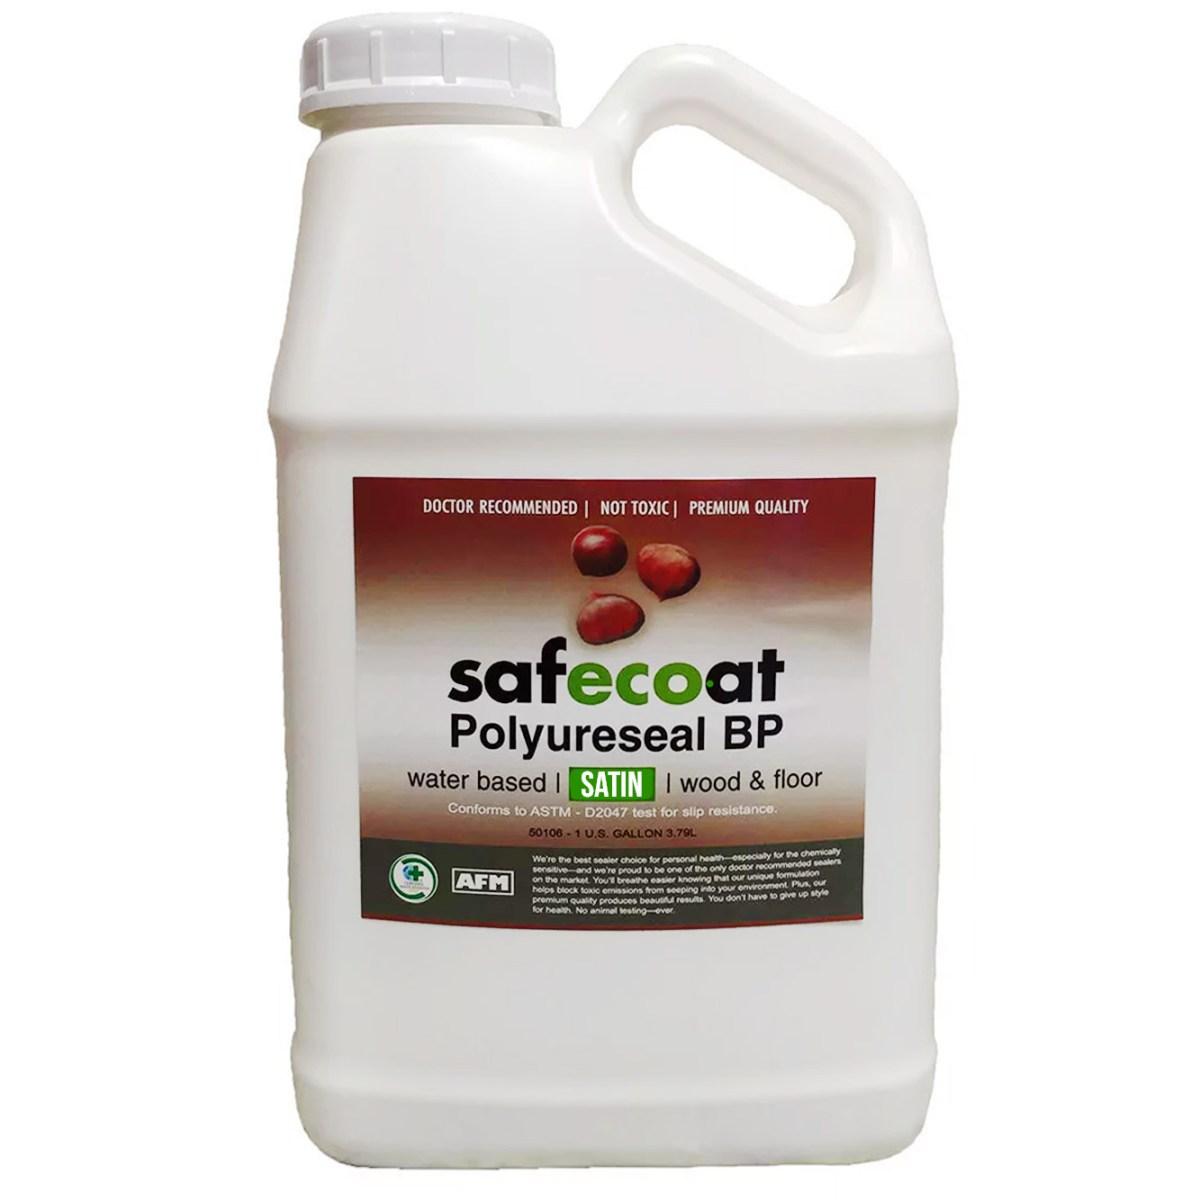 Polyureseal Bp Afm Safecoat Eco Building Products